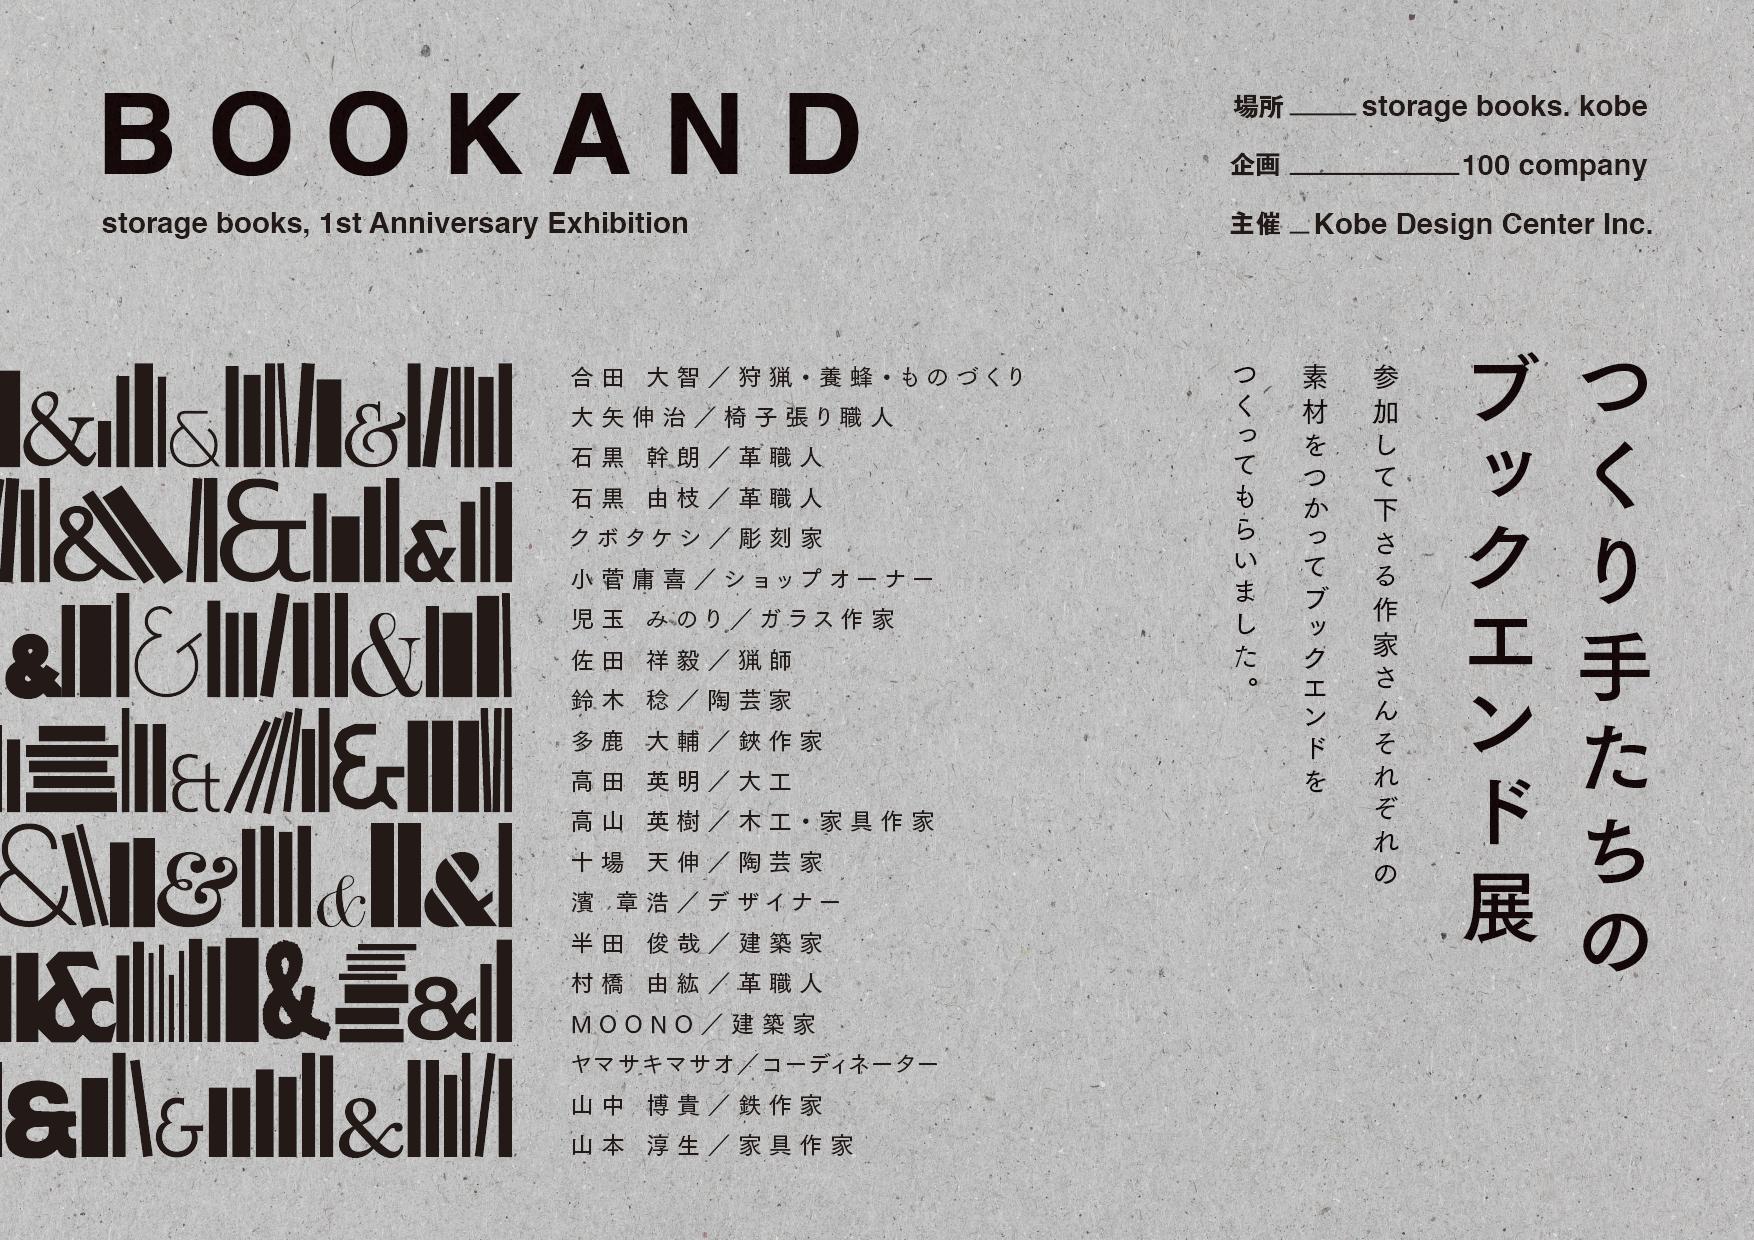 storage books1周年記念「BOOKAND」展を開催します